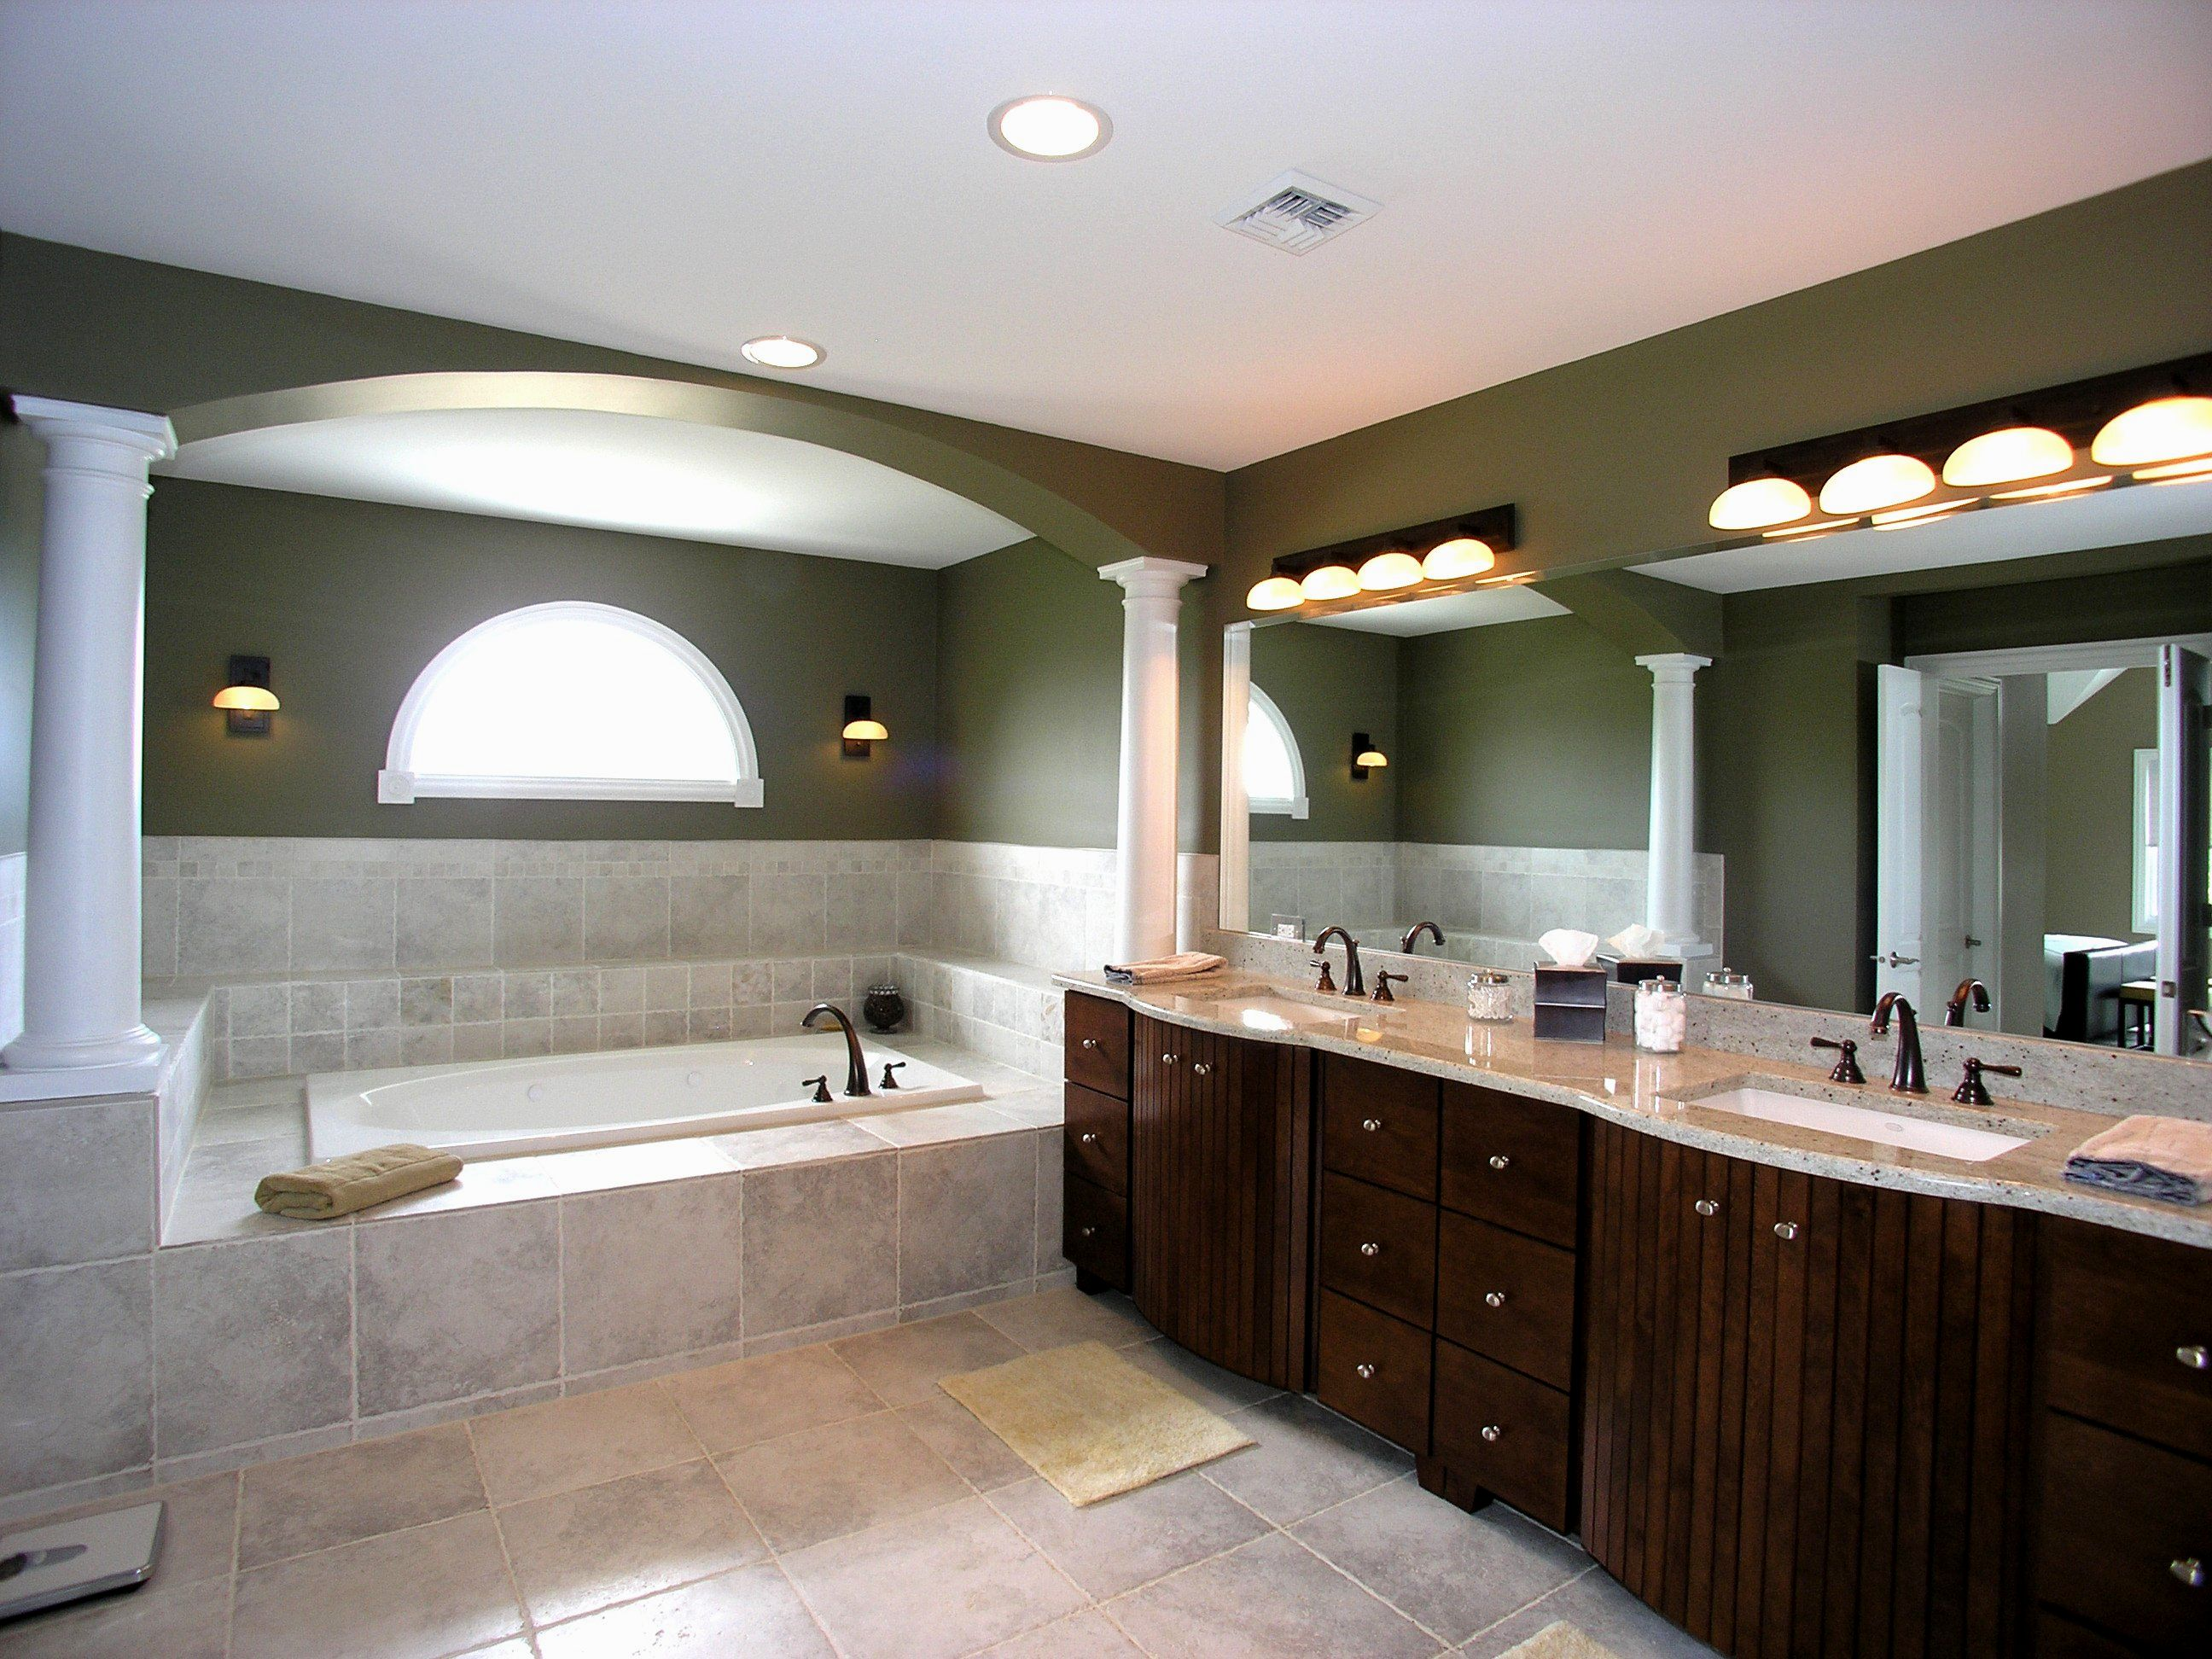 luxury 48 inch bathroom light fixture plan-New 48 Inch Bathroom Light Fixture Concept